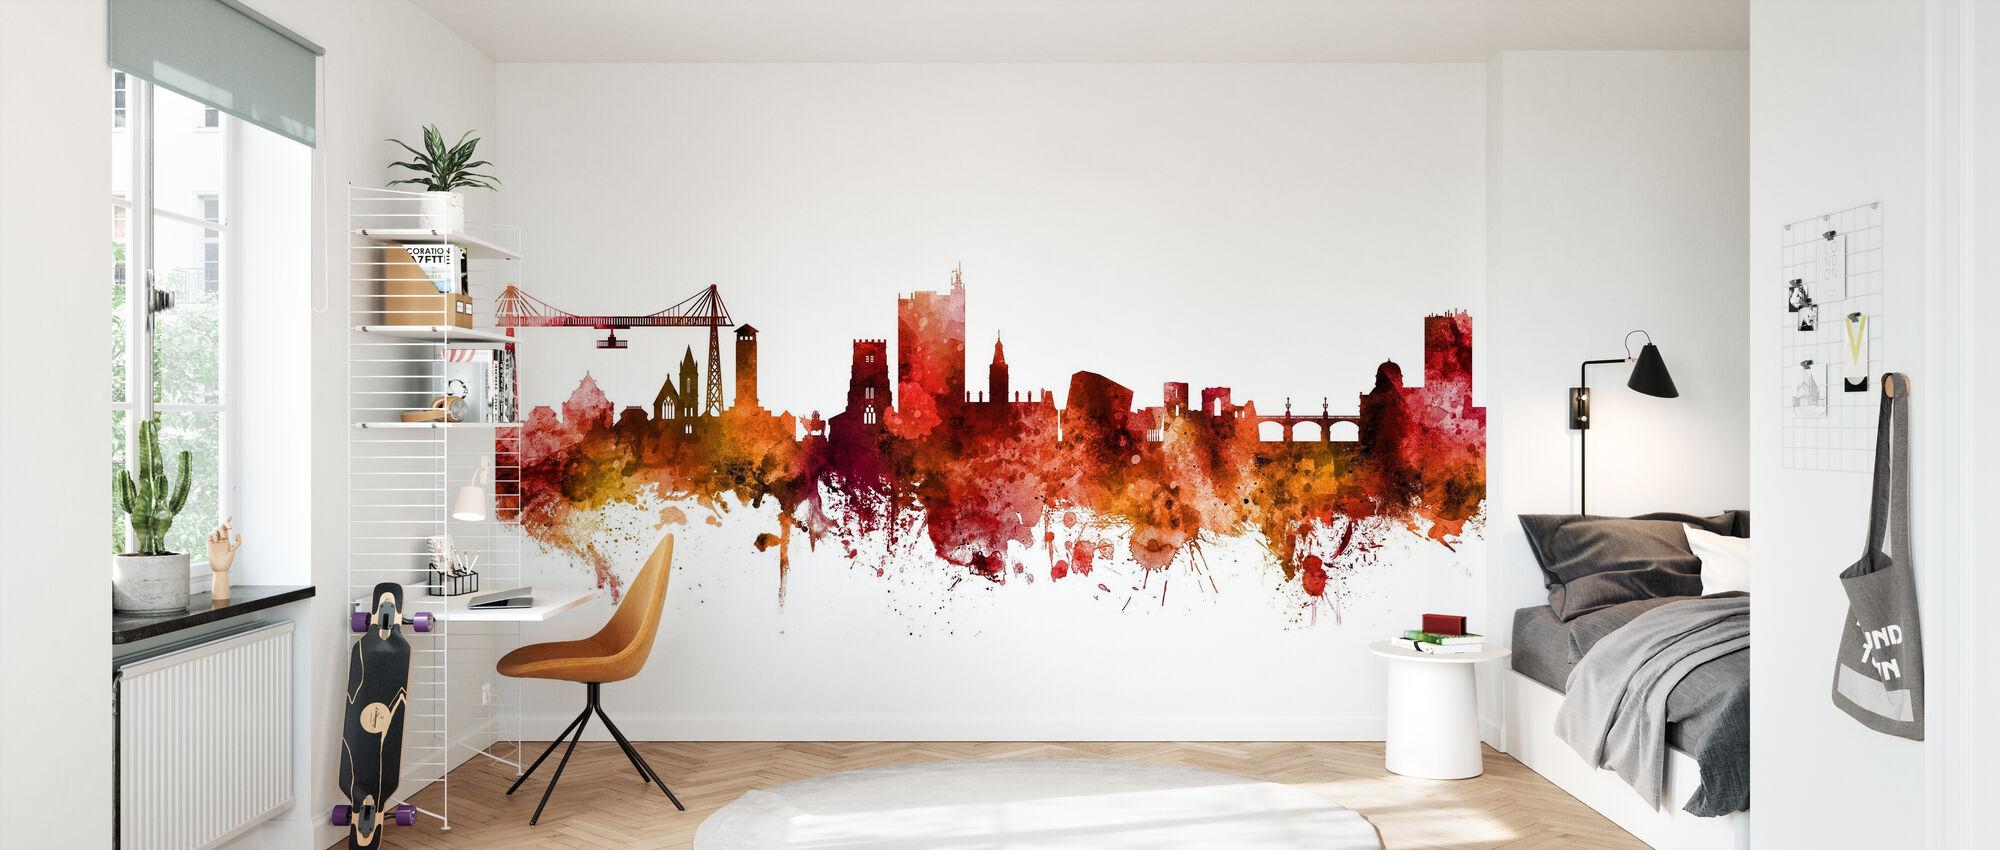 Newport Wales Skyline - Wallpaper - Kids Room